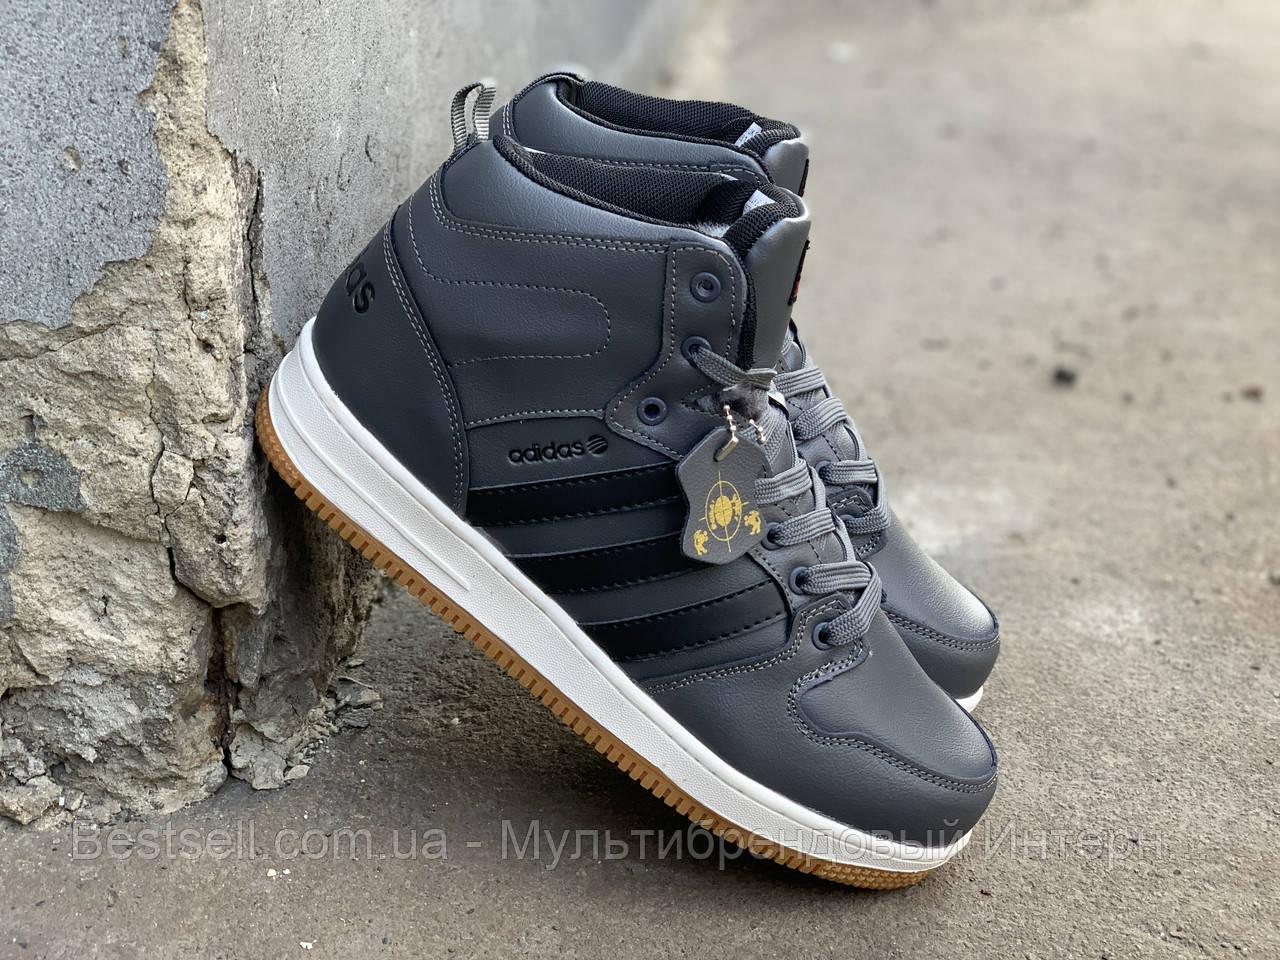 Adidas Cloudfoam 3-044 ⏩ [ 41 останній розмір ]